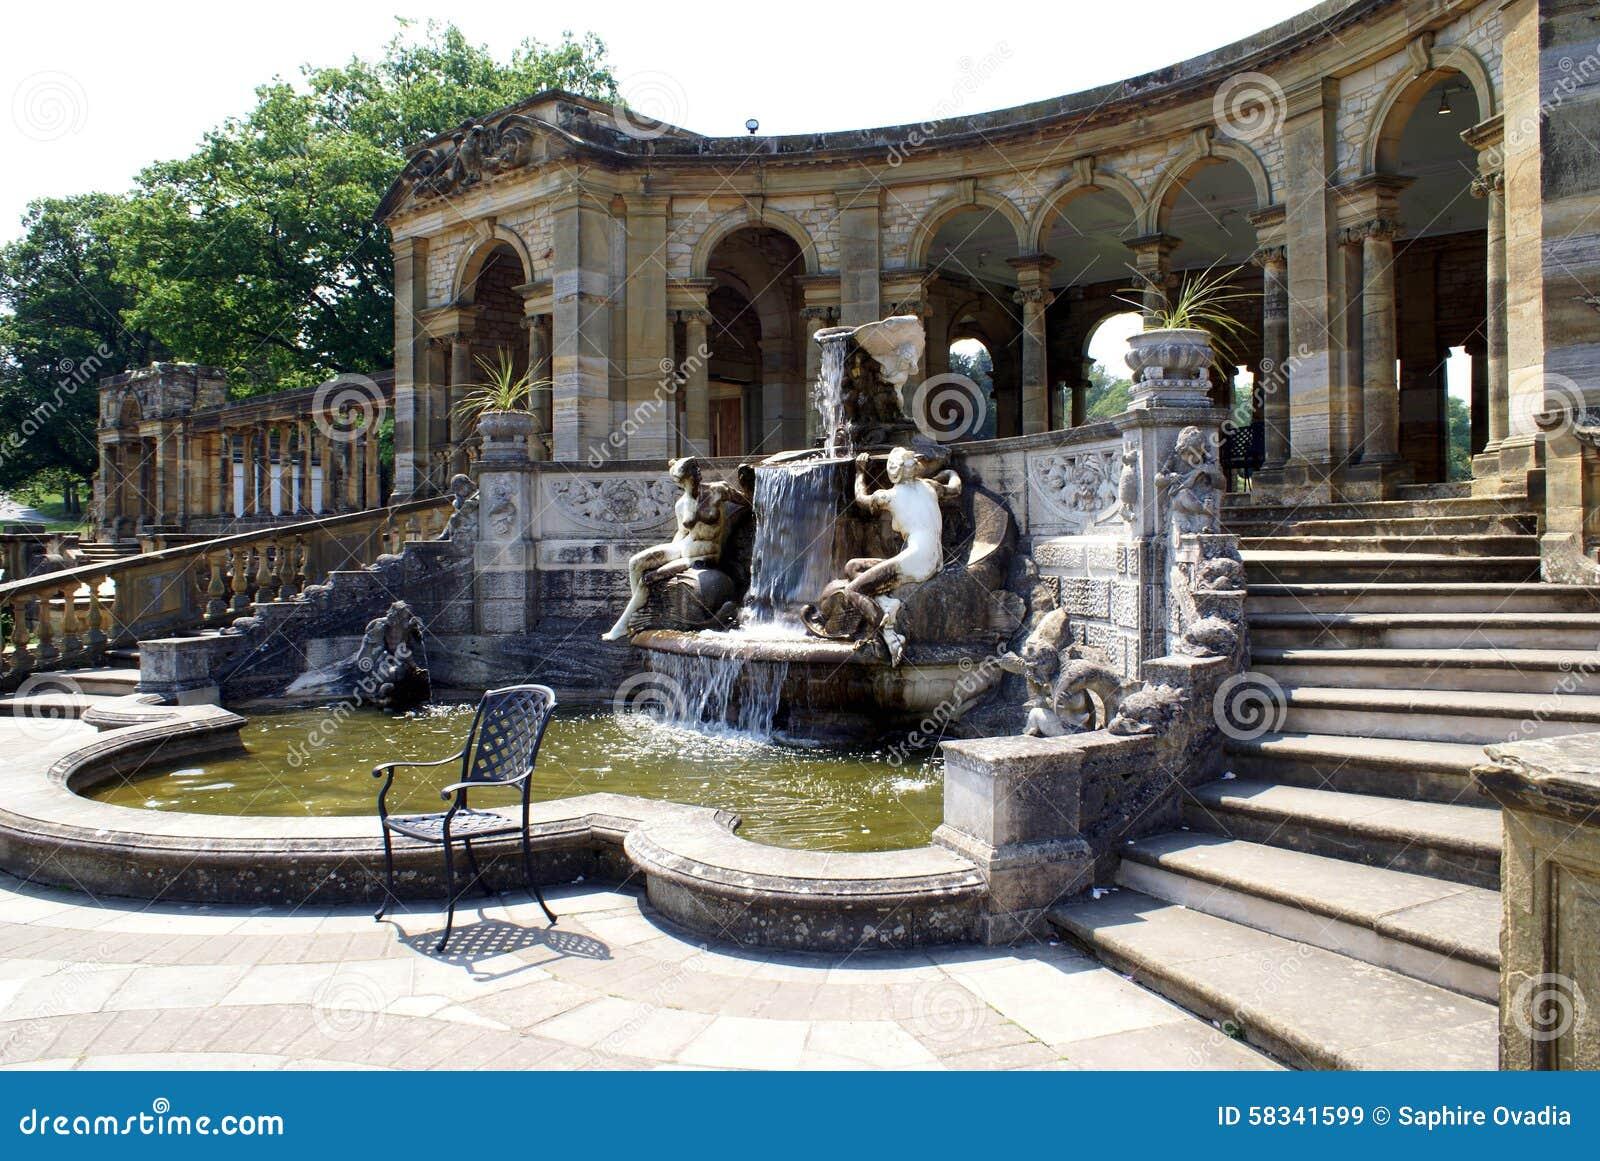 Hever Roszuje fontannę & kolumnadę w Hever, Edenbridge, Kent, Anglia, Europa